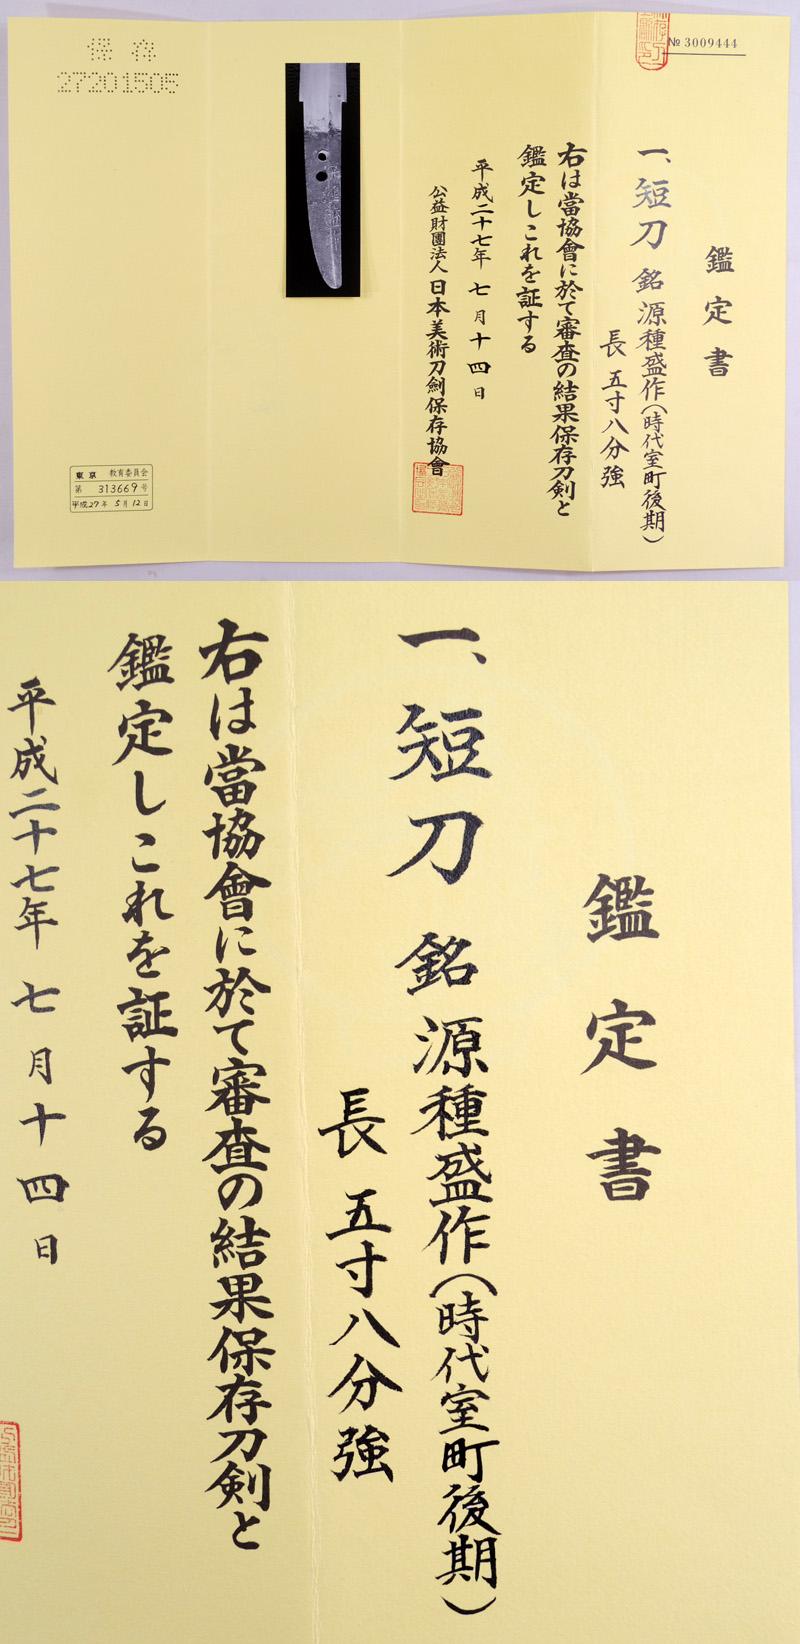 源種盛作(時代室町後期) Picture of Certificate